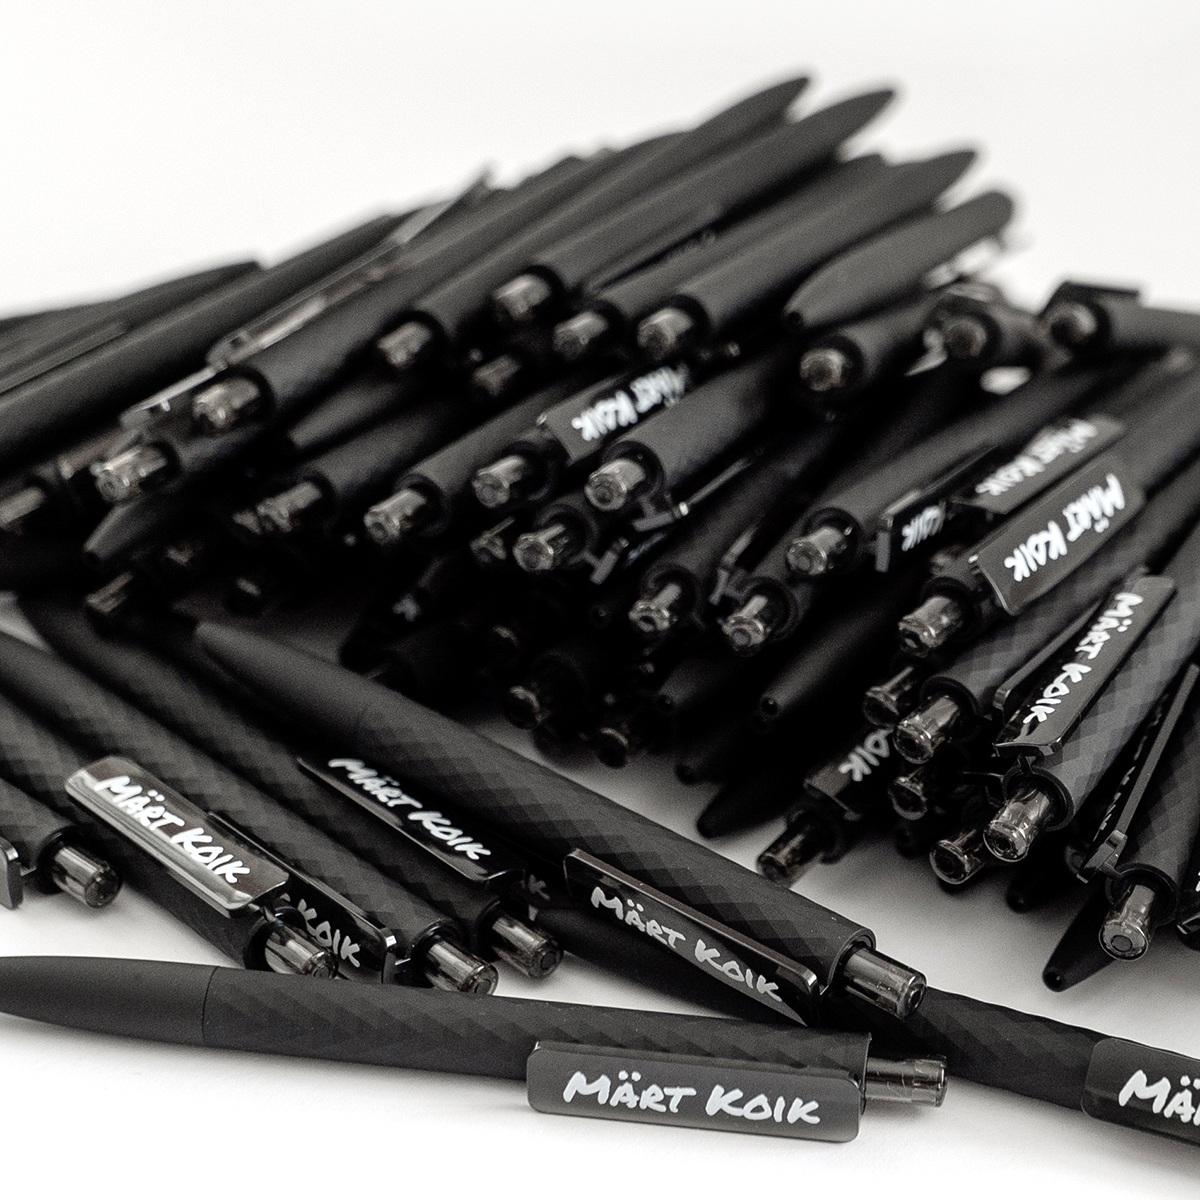 MK pastakas